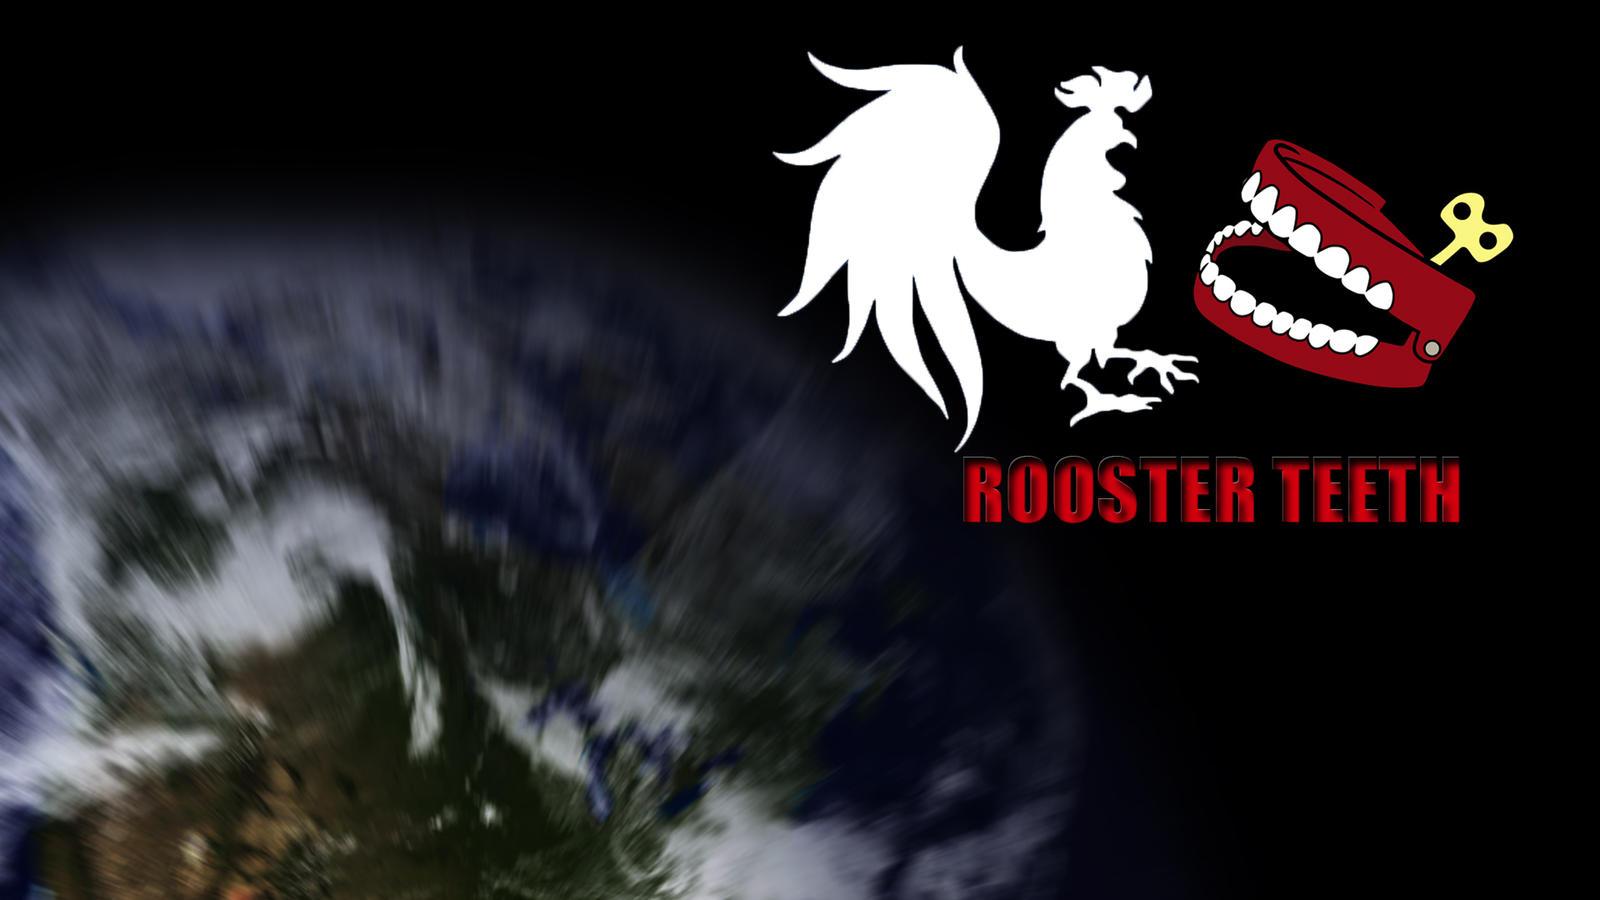 Rooster Teeth Wallpaper by LegionOfSaddos on DeviantArt